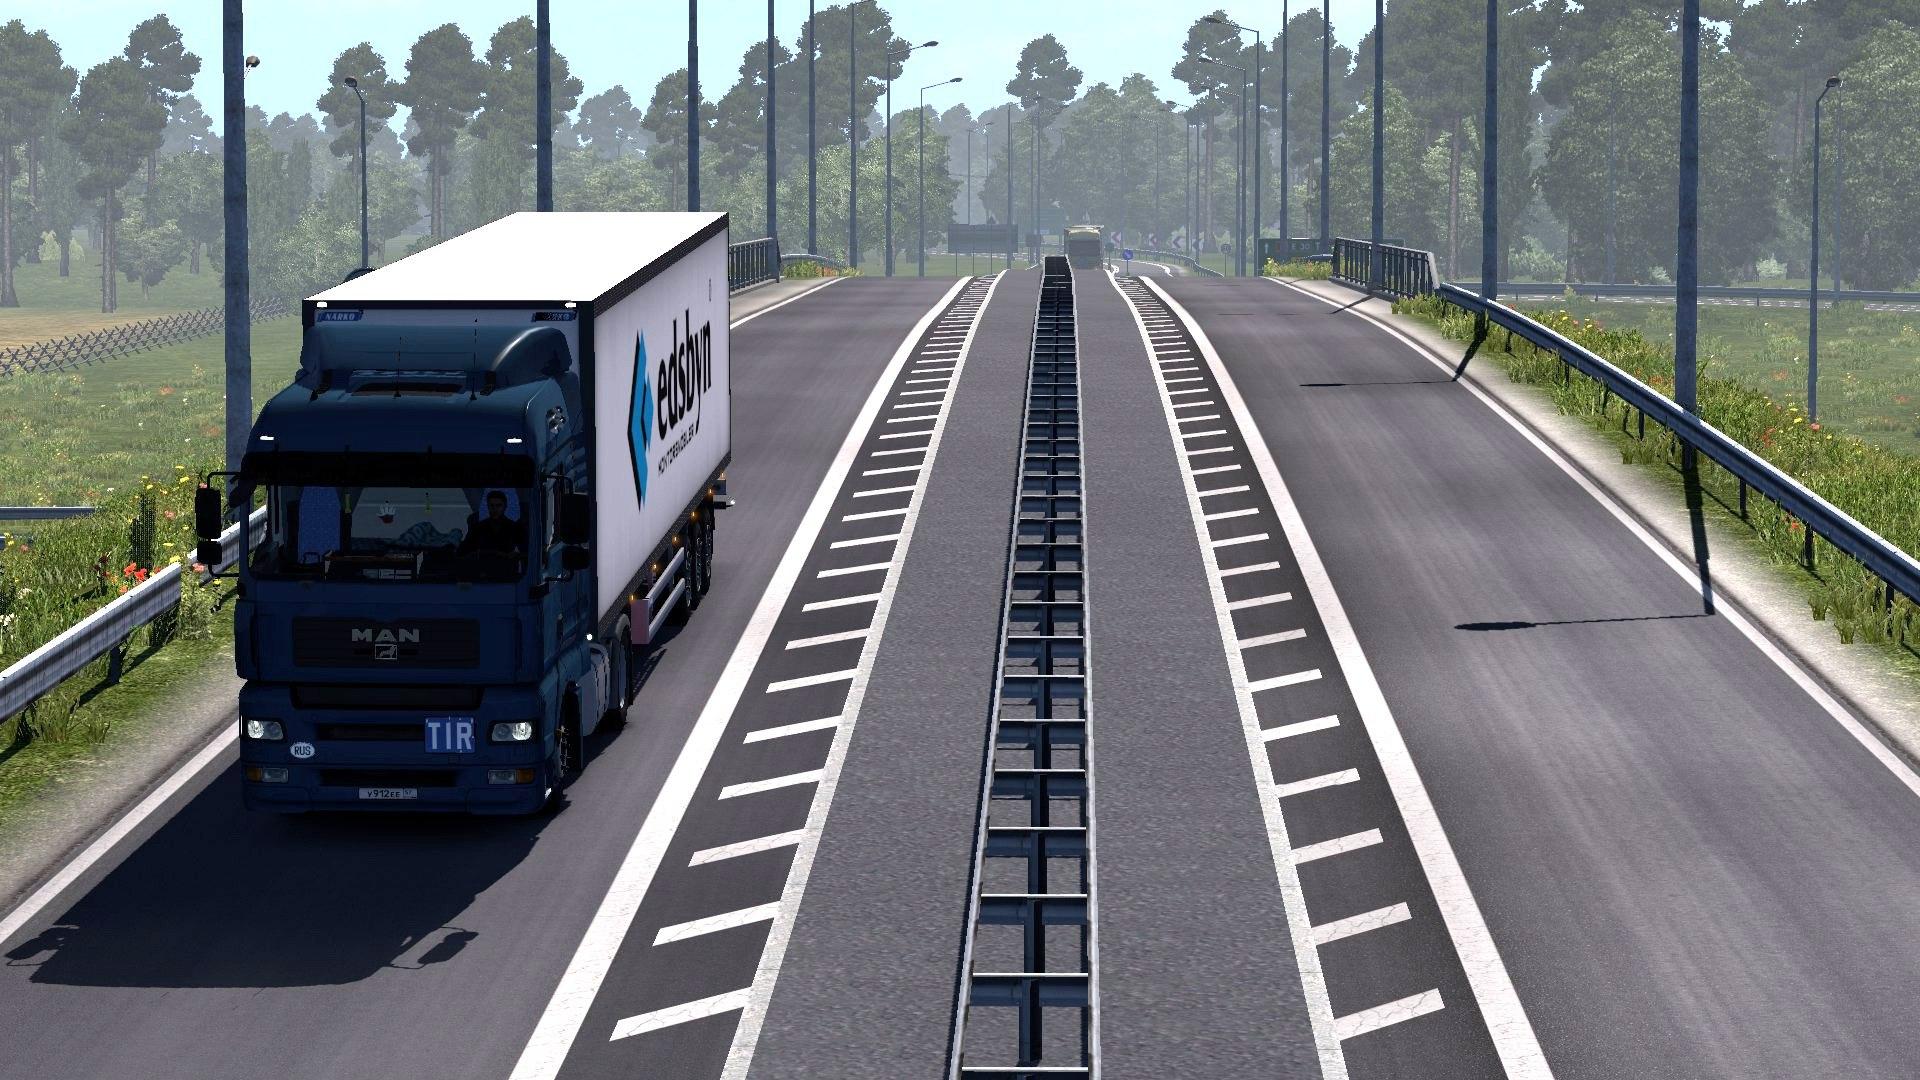 Uc5yrFPTf28.jpg - Euro Truck Simulator 2